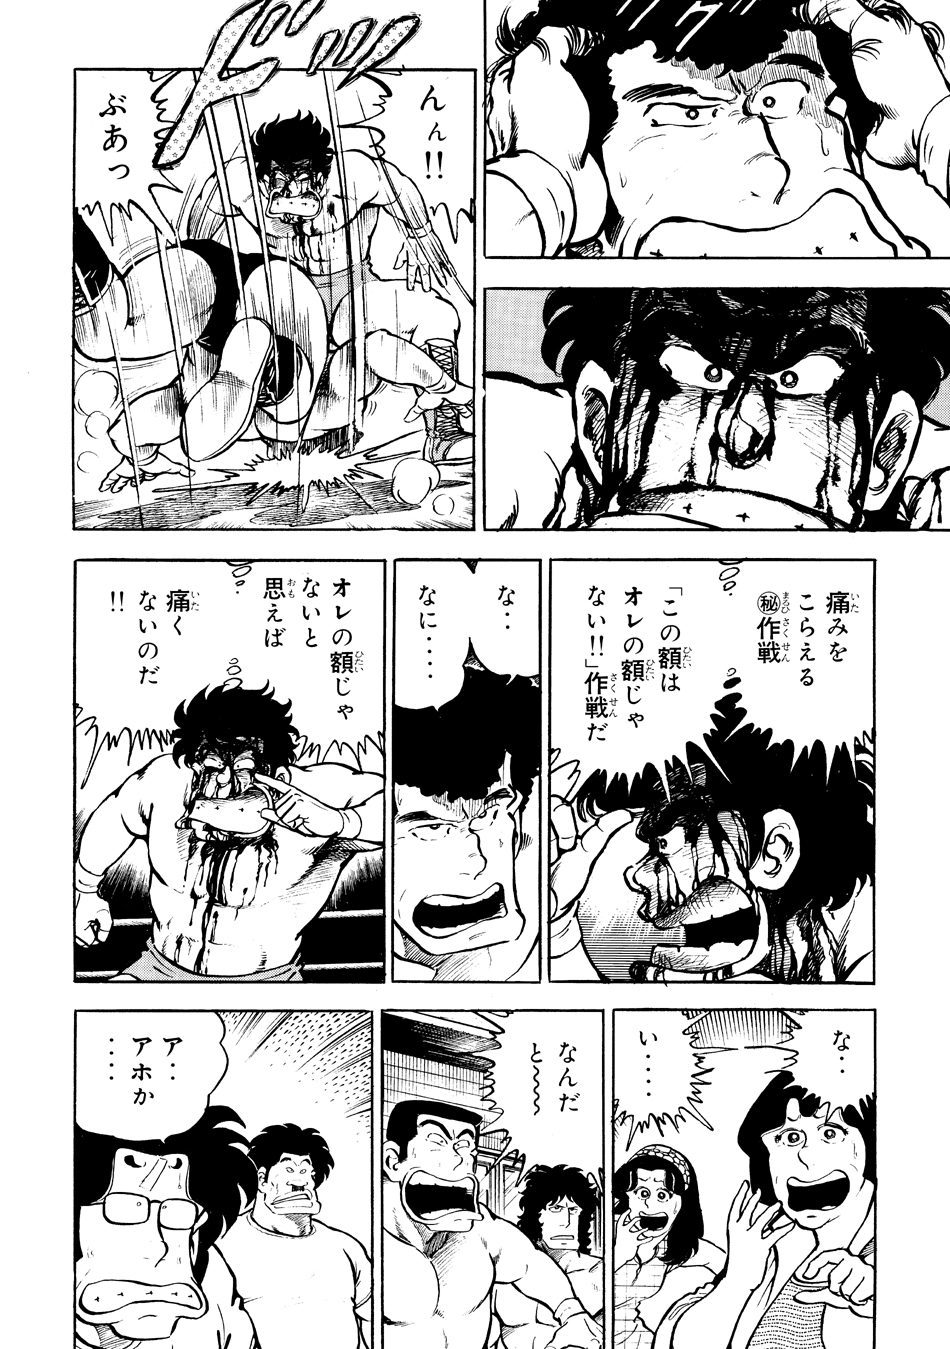 sanshiro_18